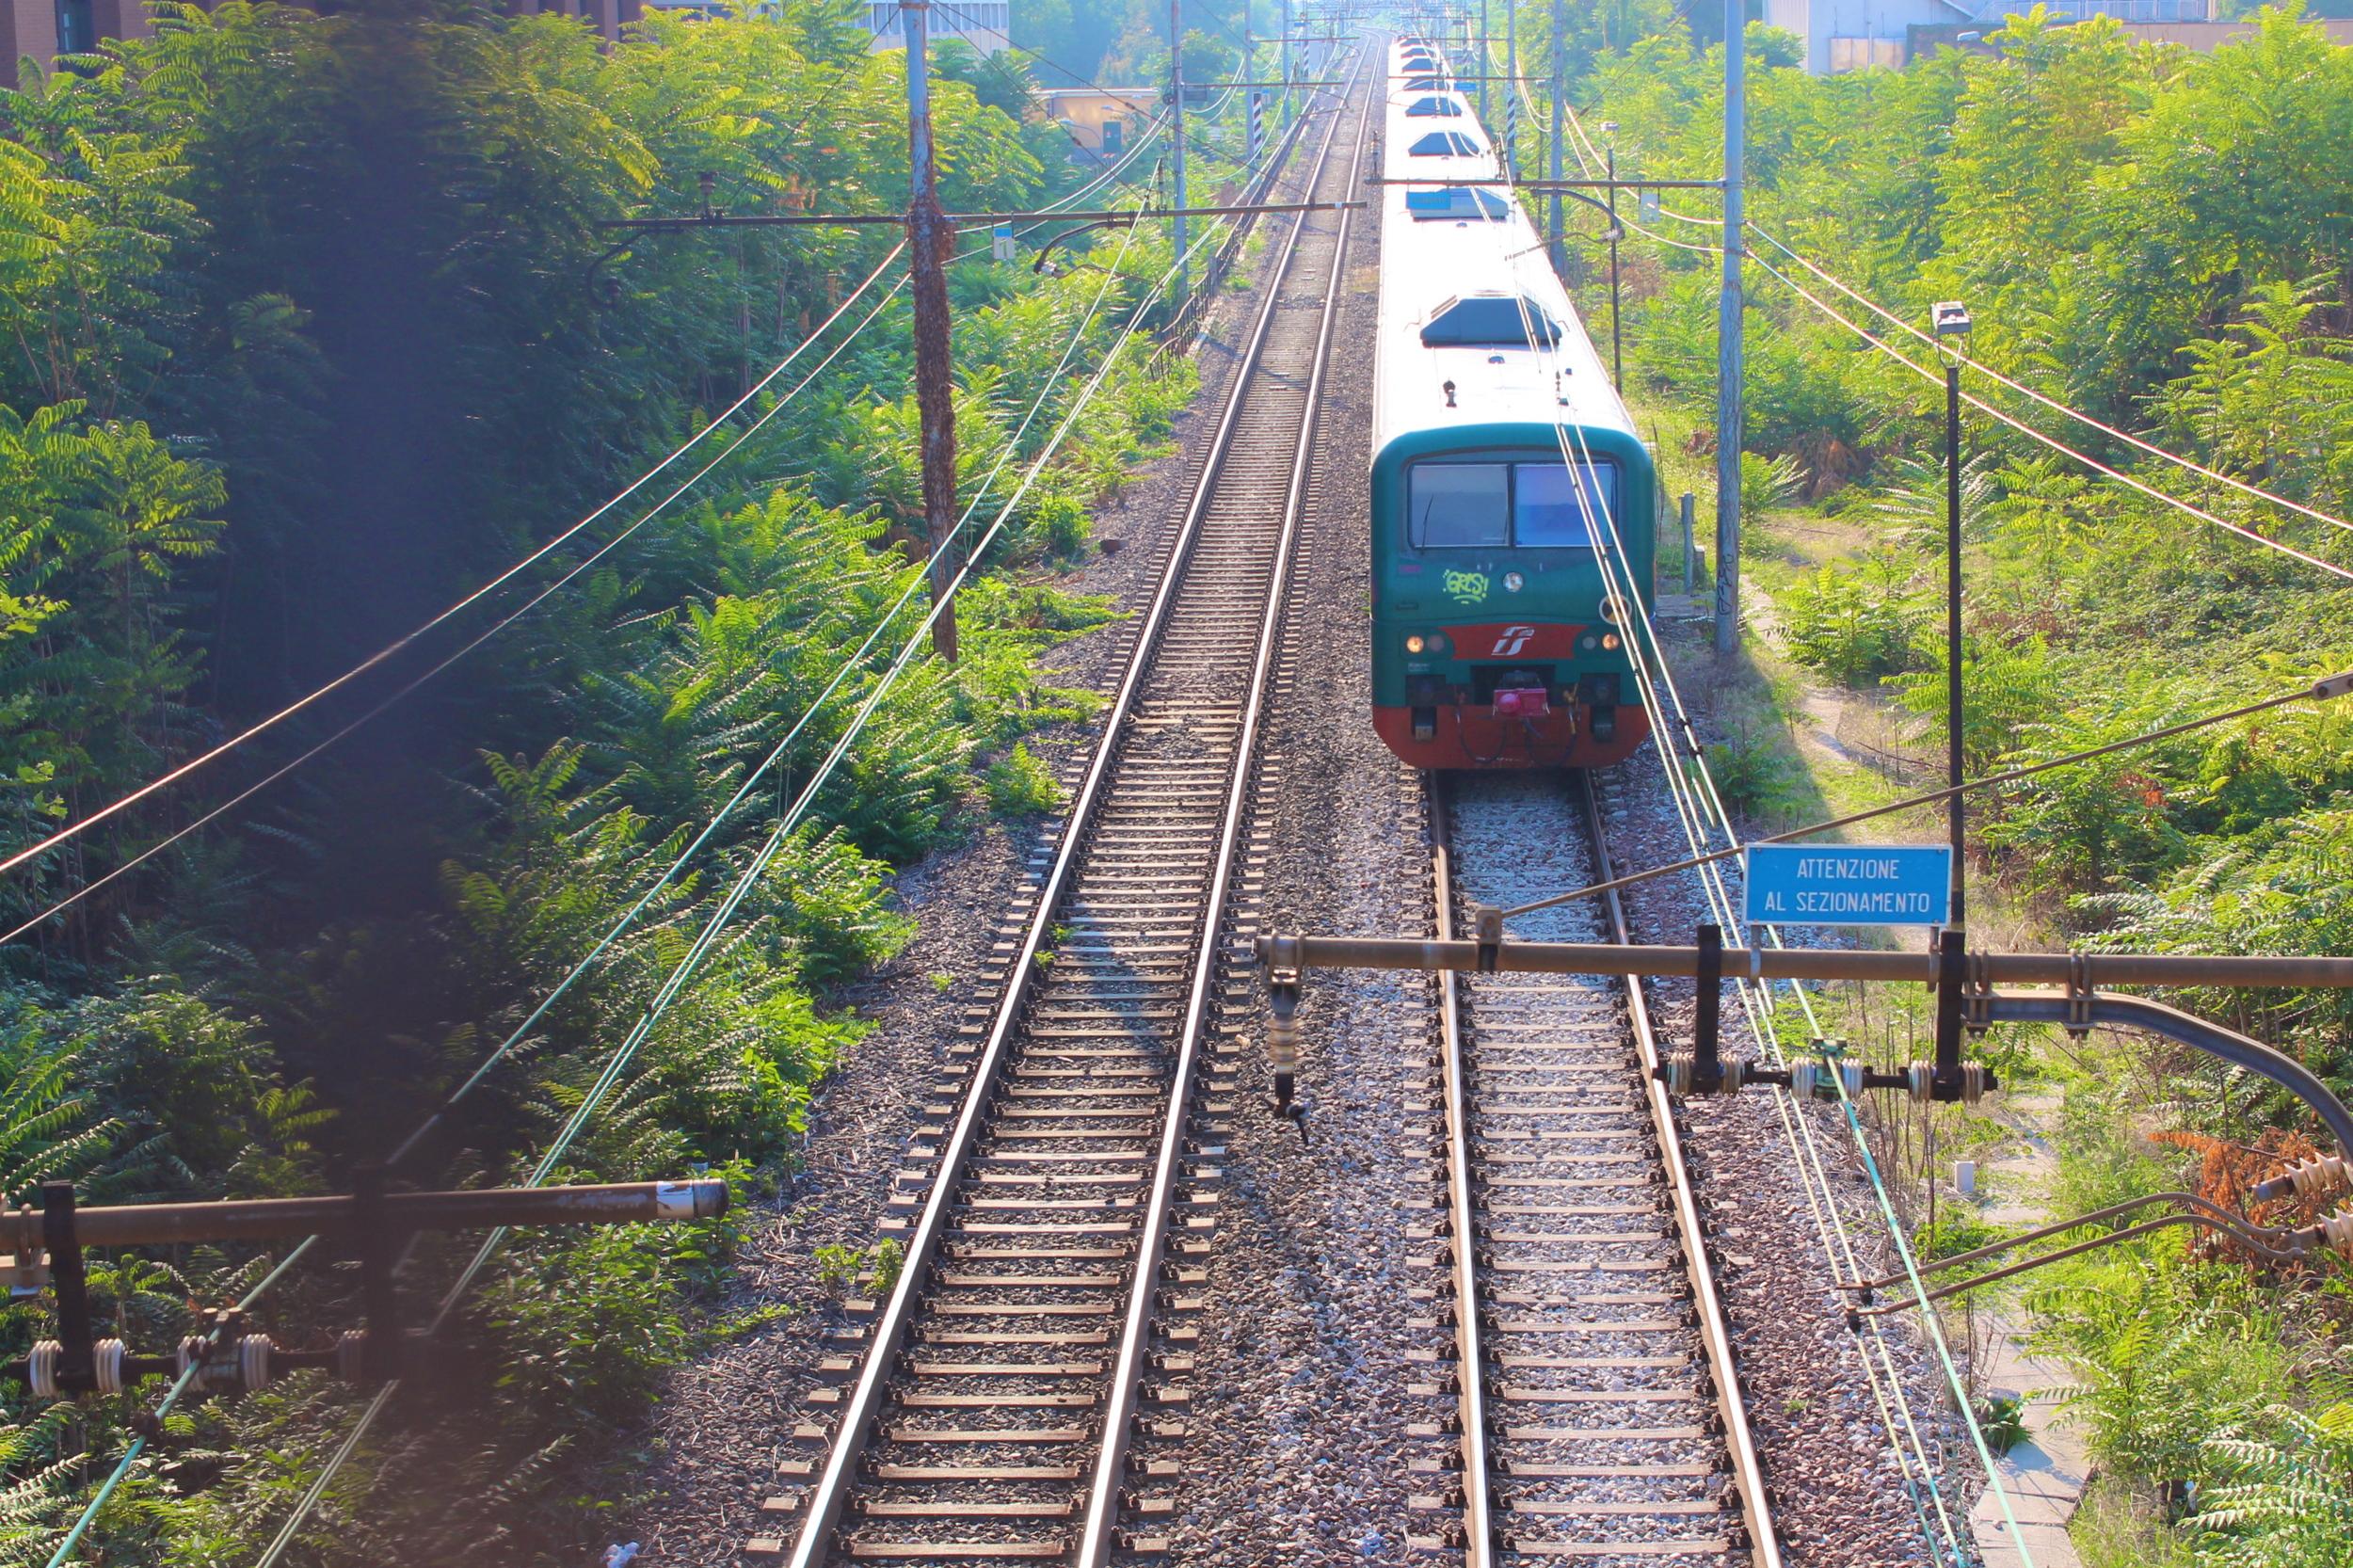 Kaci Nicole - Train Ride to Cinque Terre